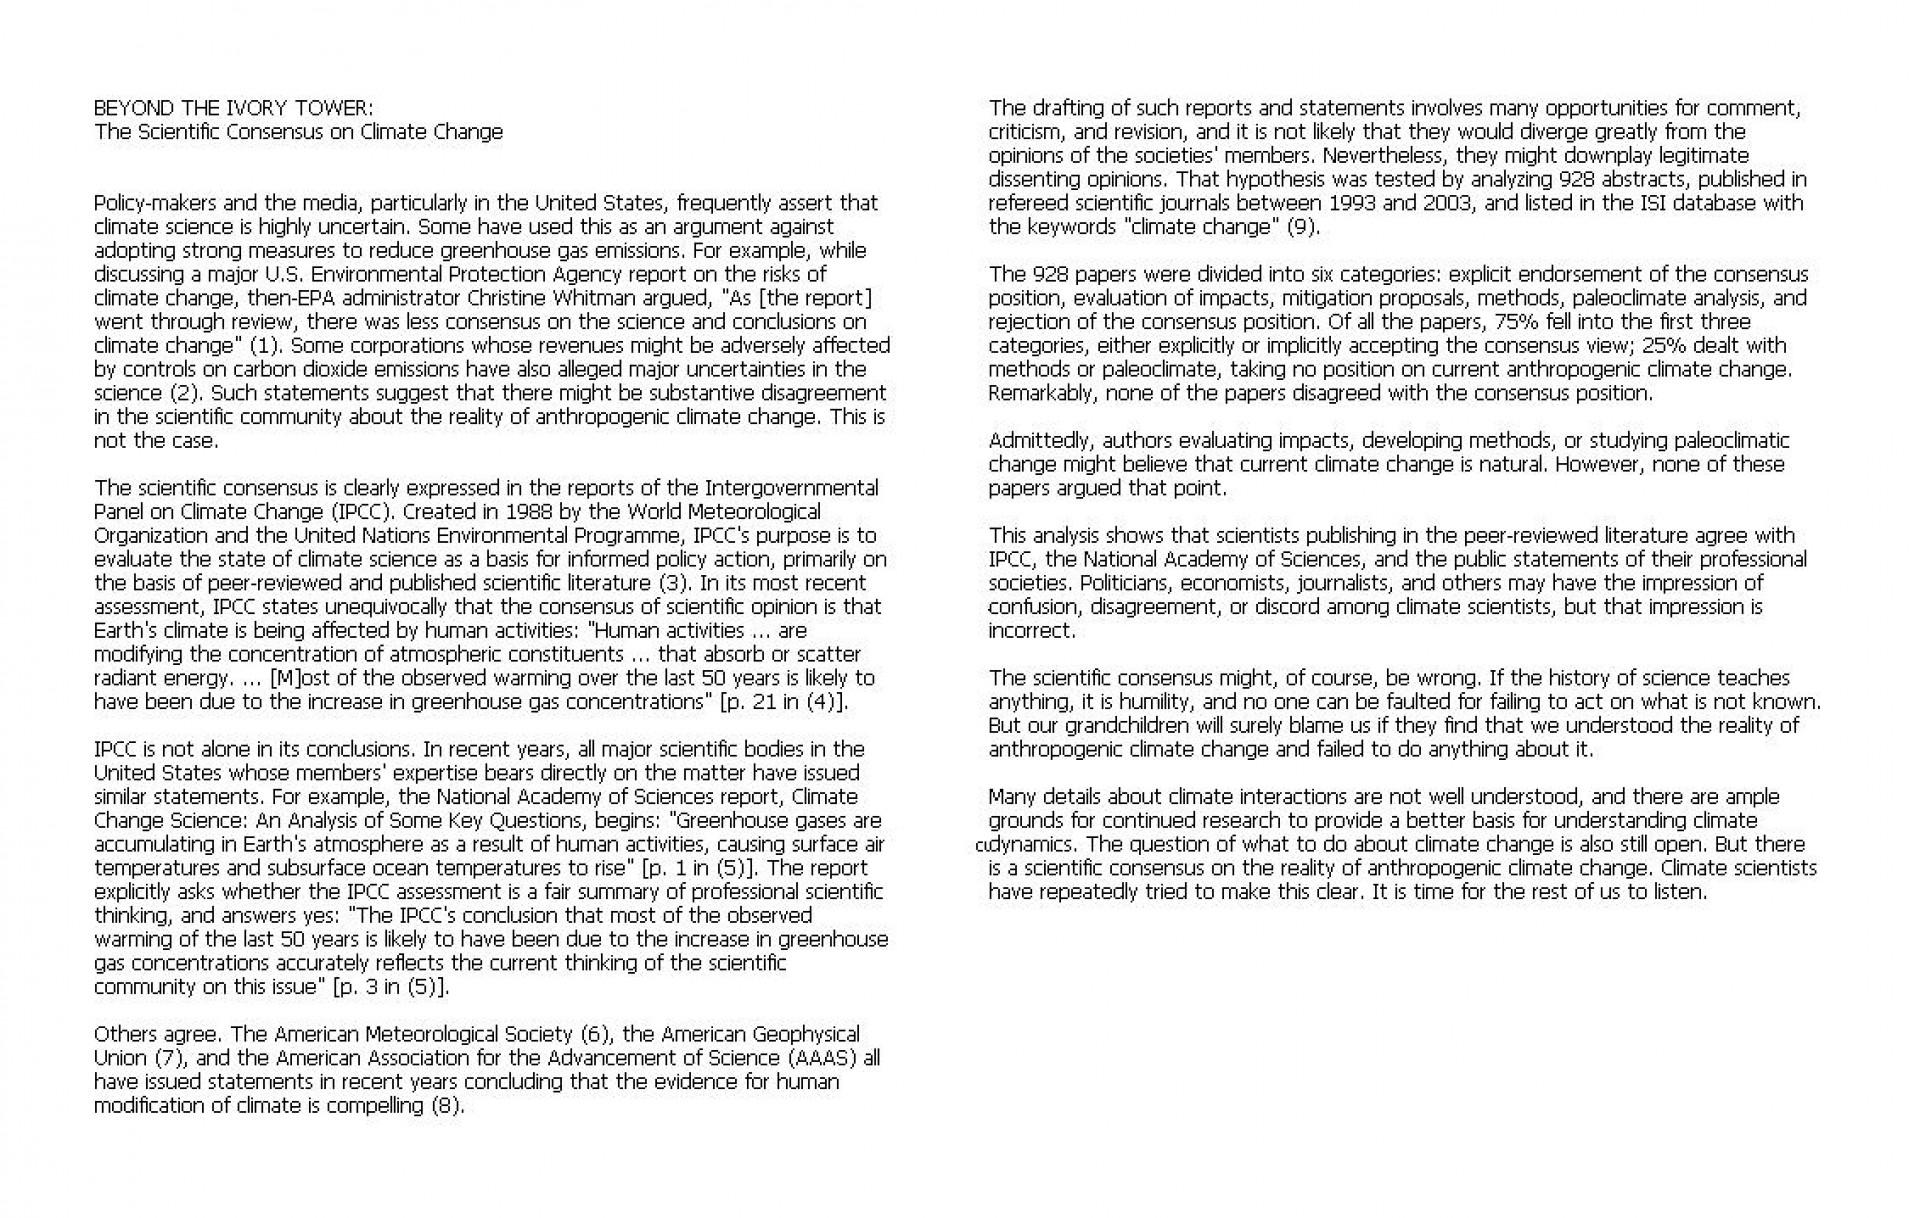 012 Paragraph Essay Sample Scientific Stirring 5 Free Outline Template Printable Argumentative 1920